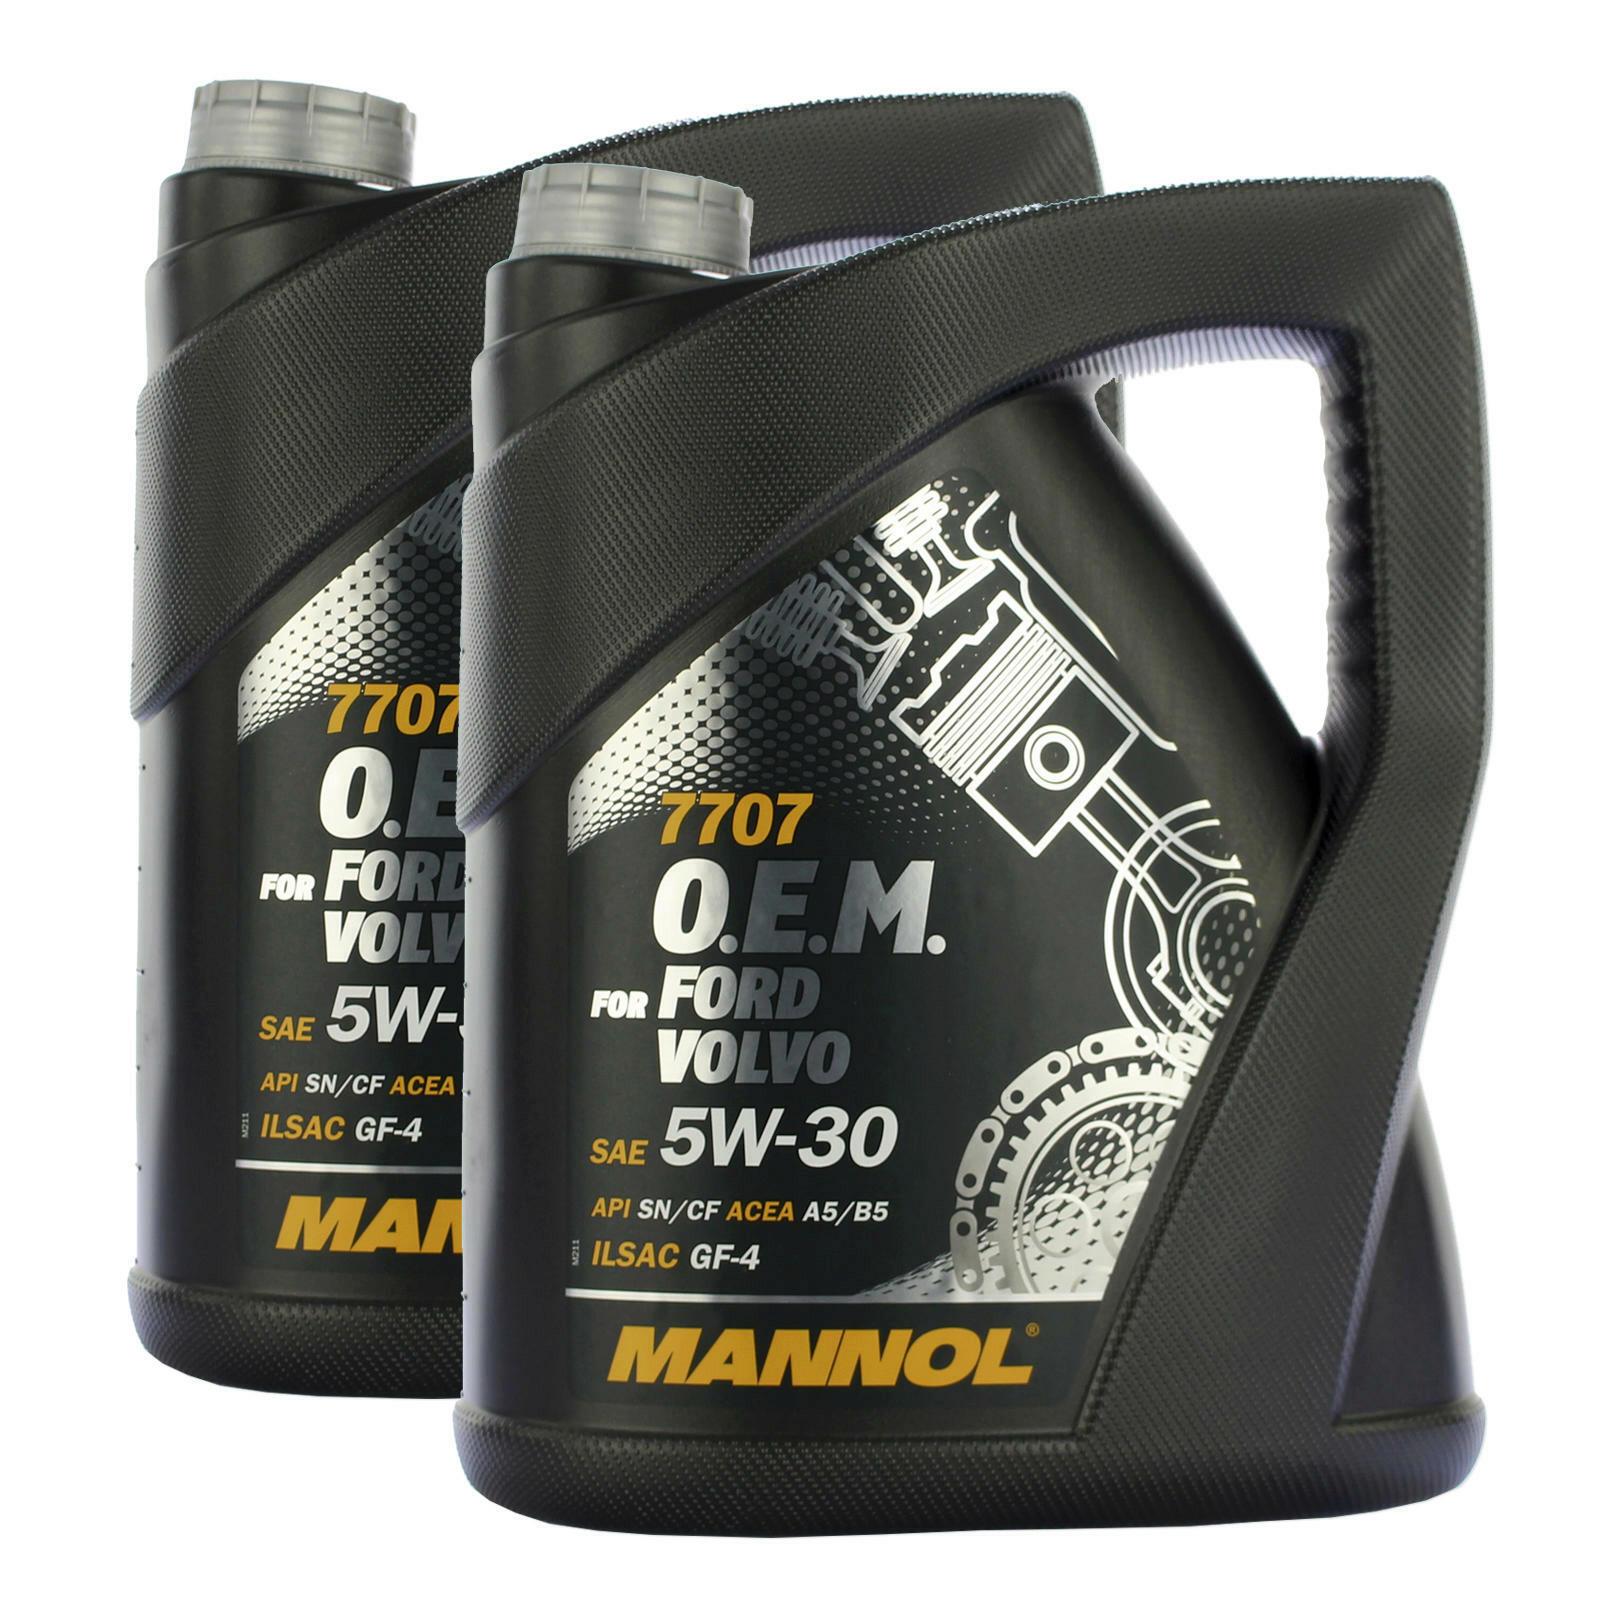 2x 5 Liter MANNOL Motoröl 5W-30 7707 O.E.M. FORD OPEL VOLVO API SN/CF